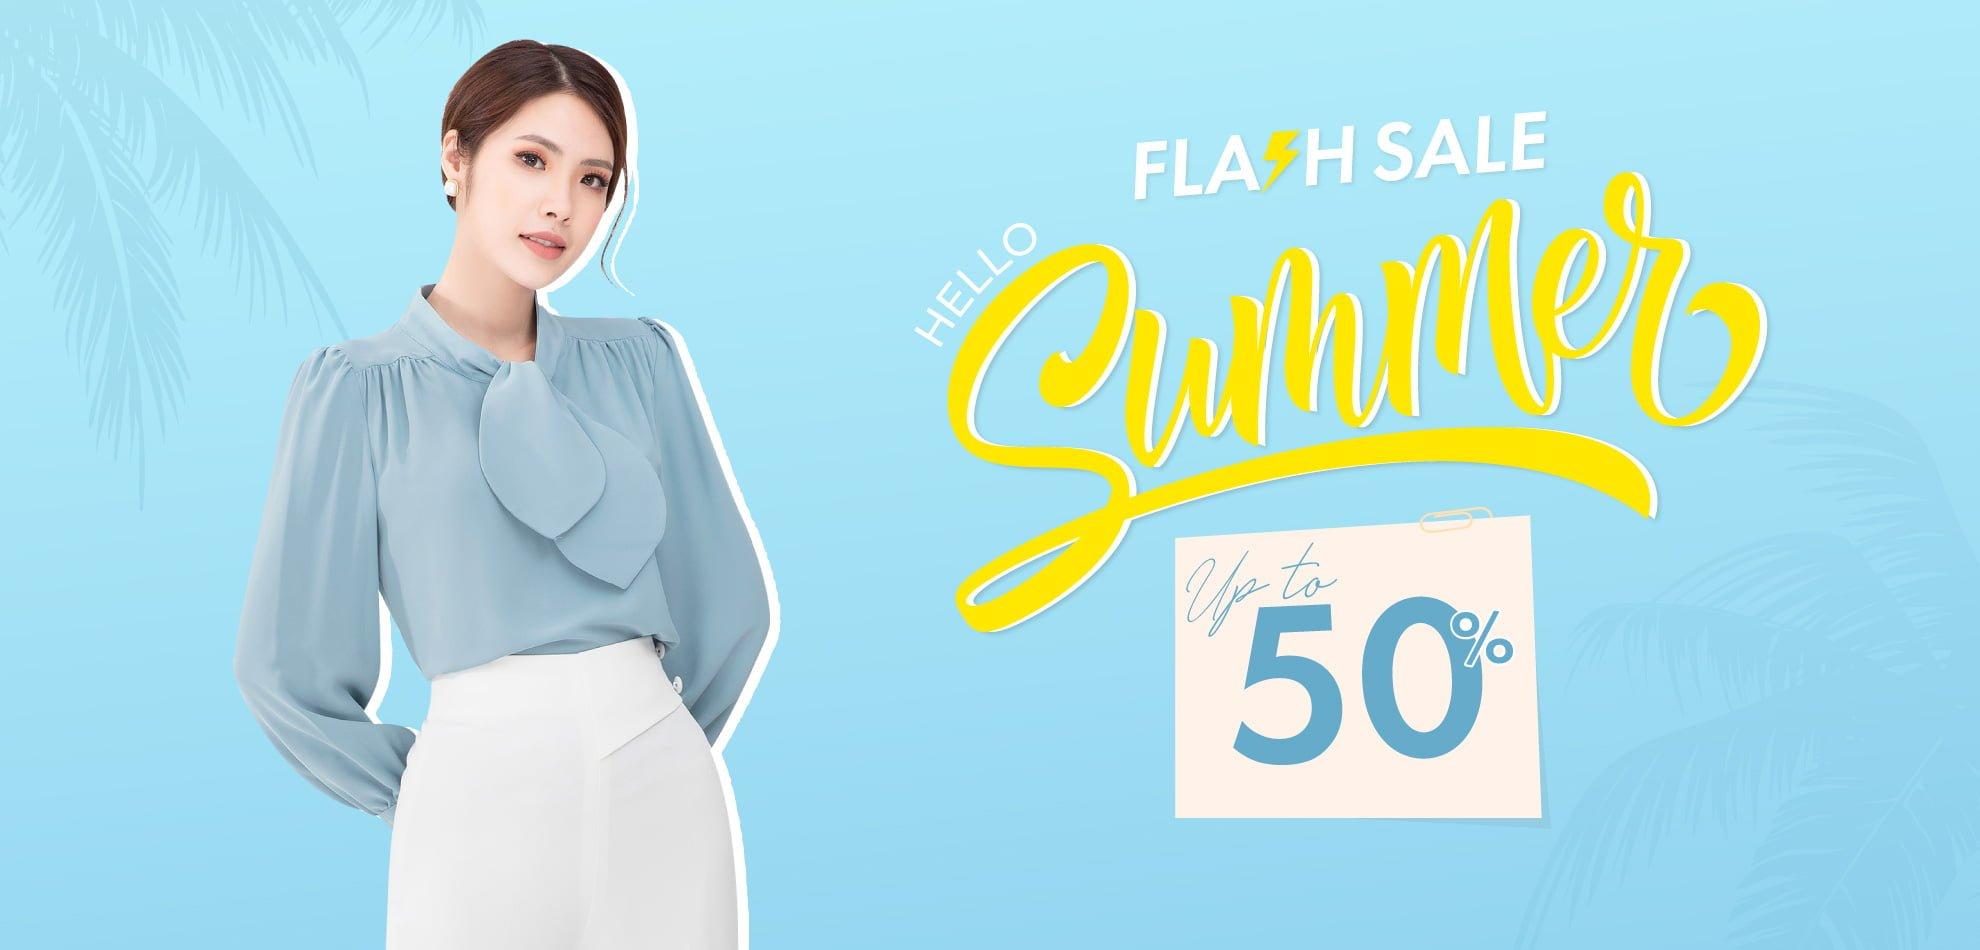 Leika flash sale hello summer 2021